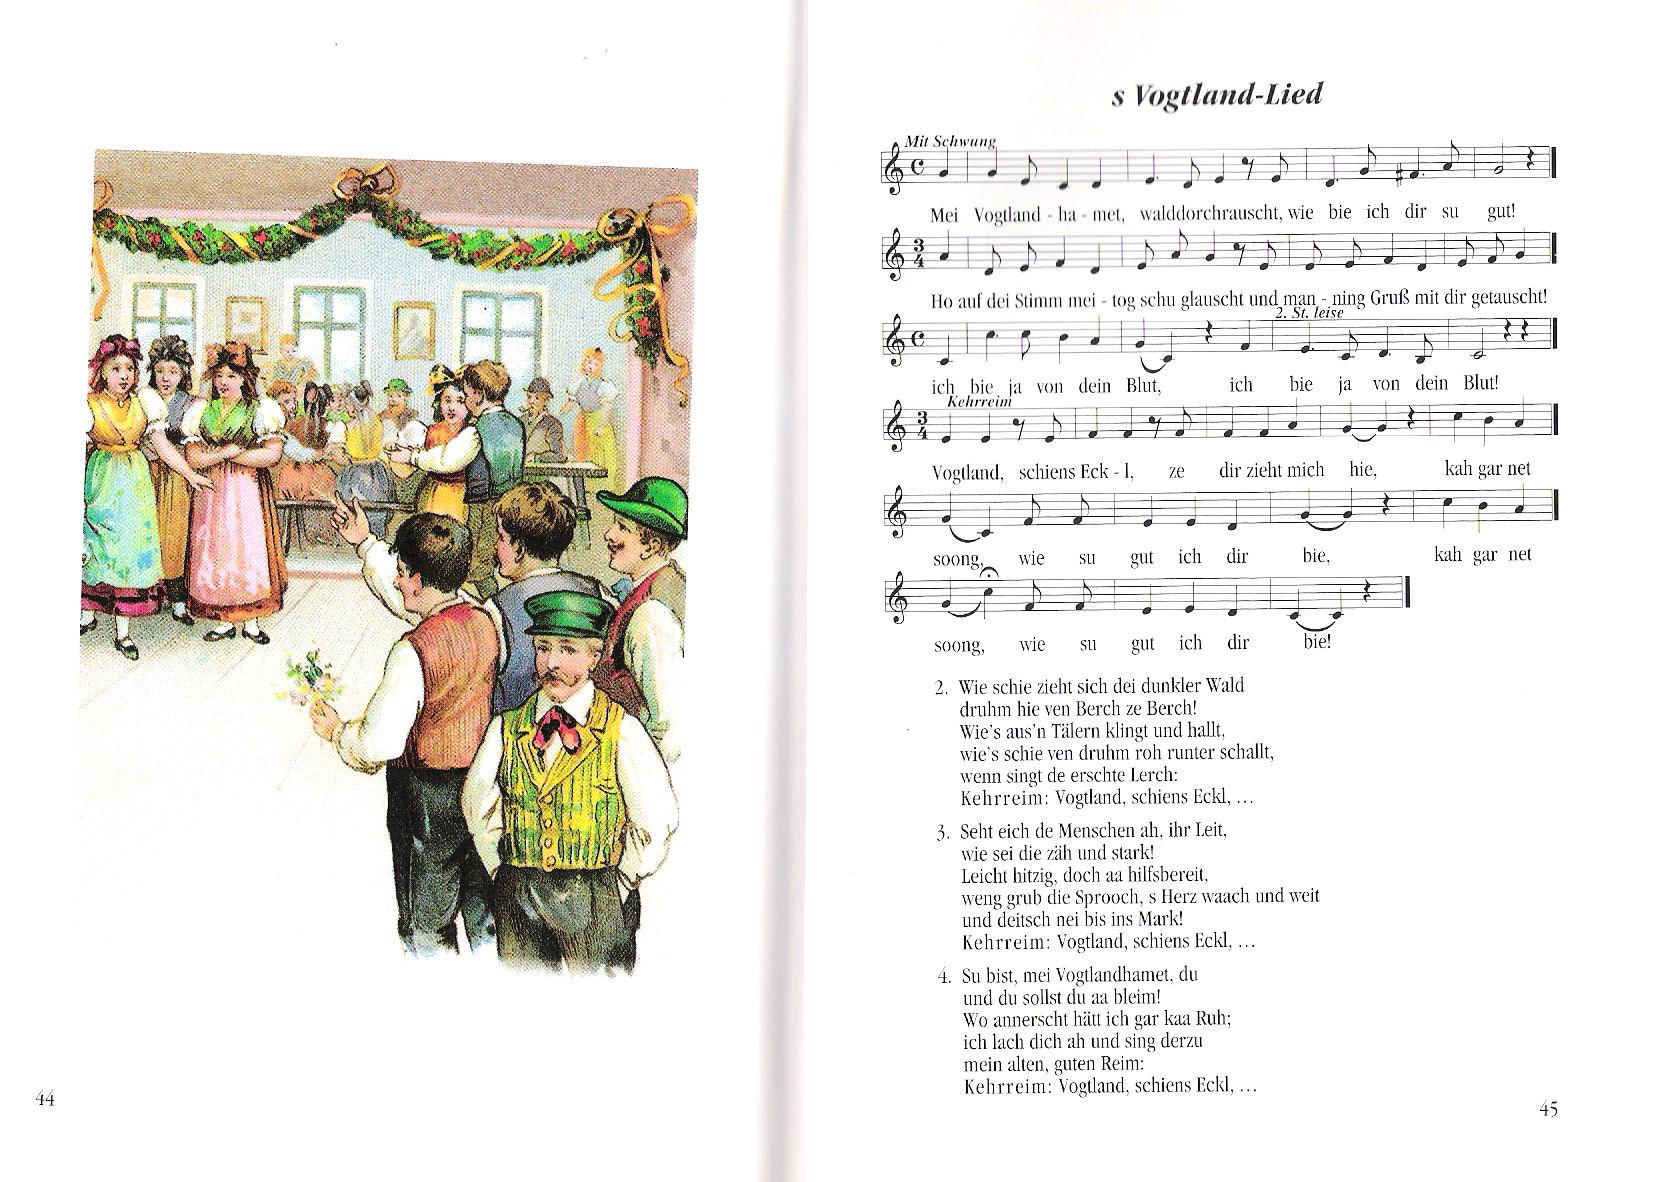 s Vogtland-Lied